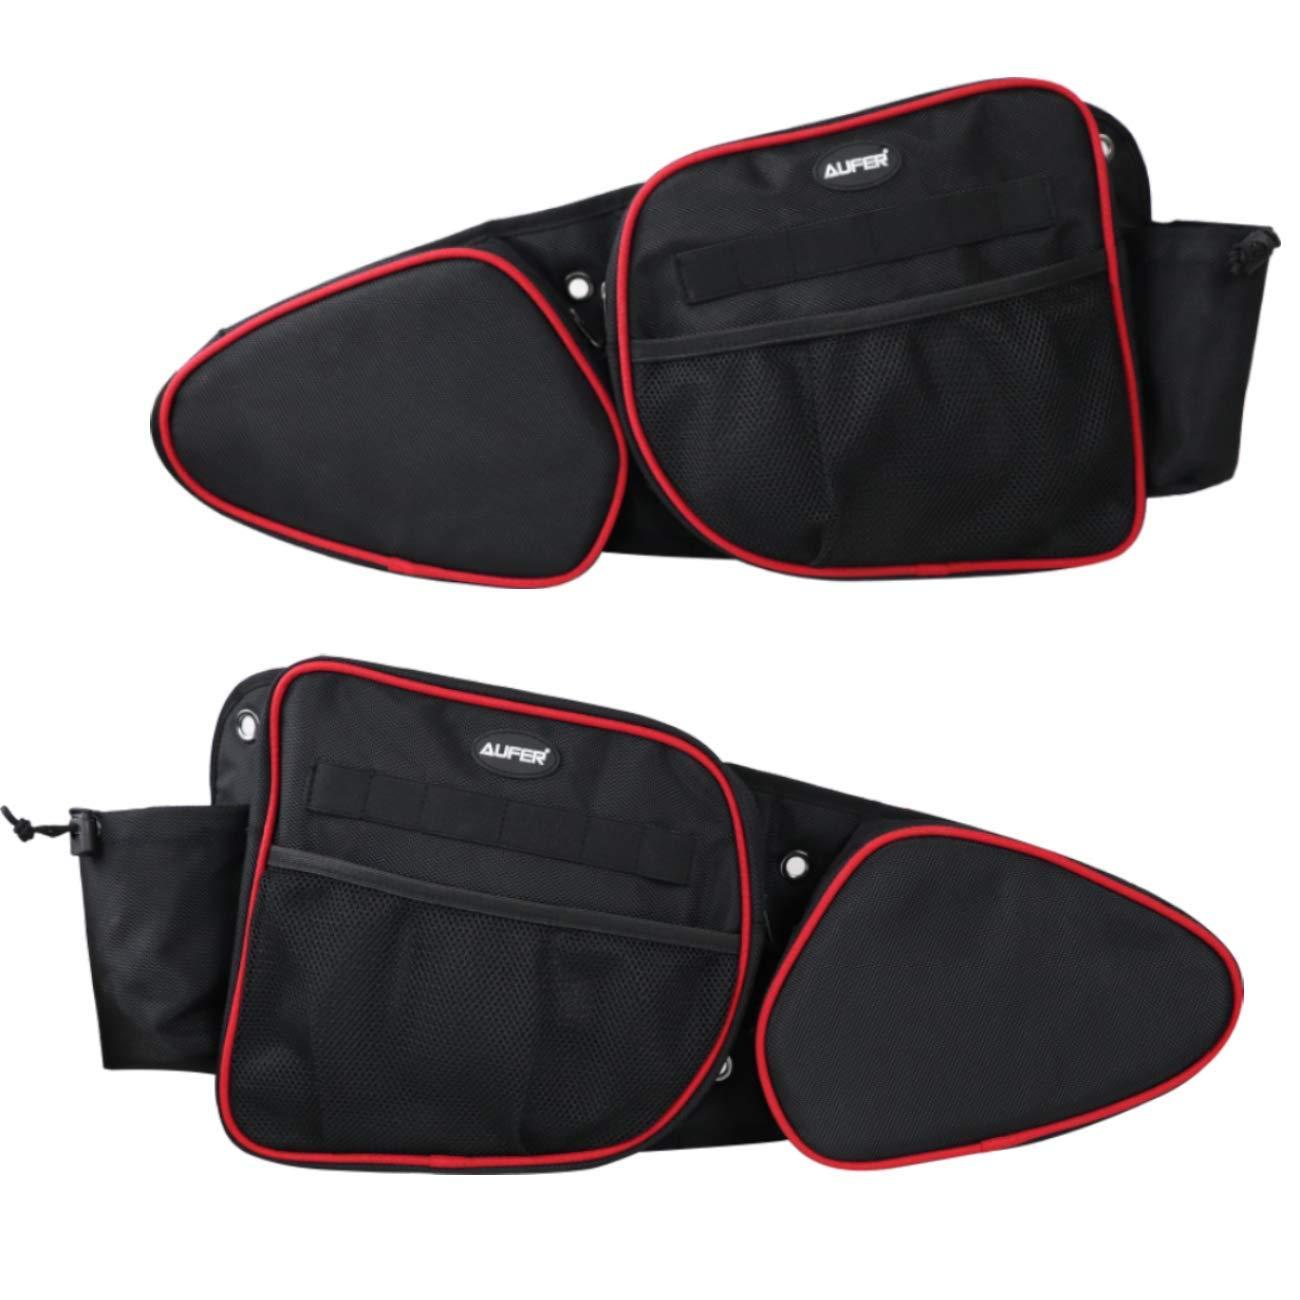 Front Door Side Storage Bag Door bags with Knee Protection For 2014-2020 UTV Polaris RZR XP Turbo Turbo S 1000 S900